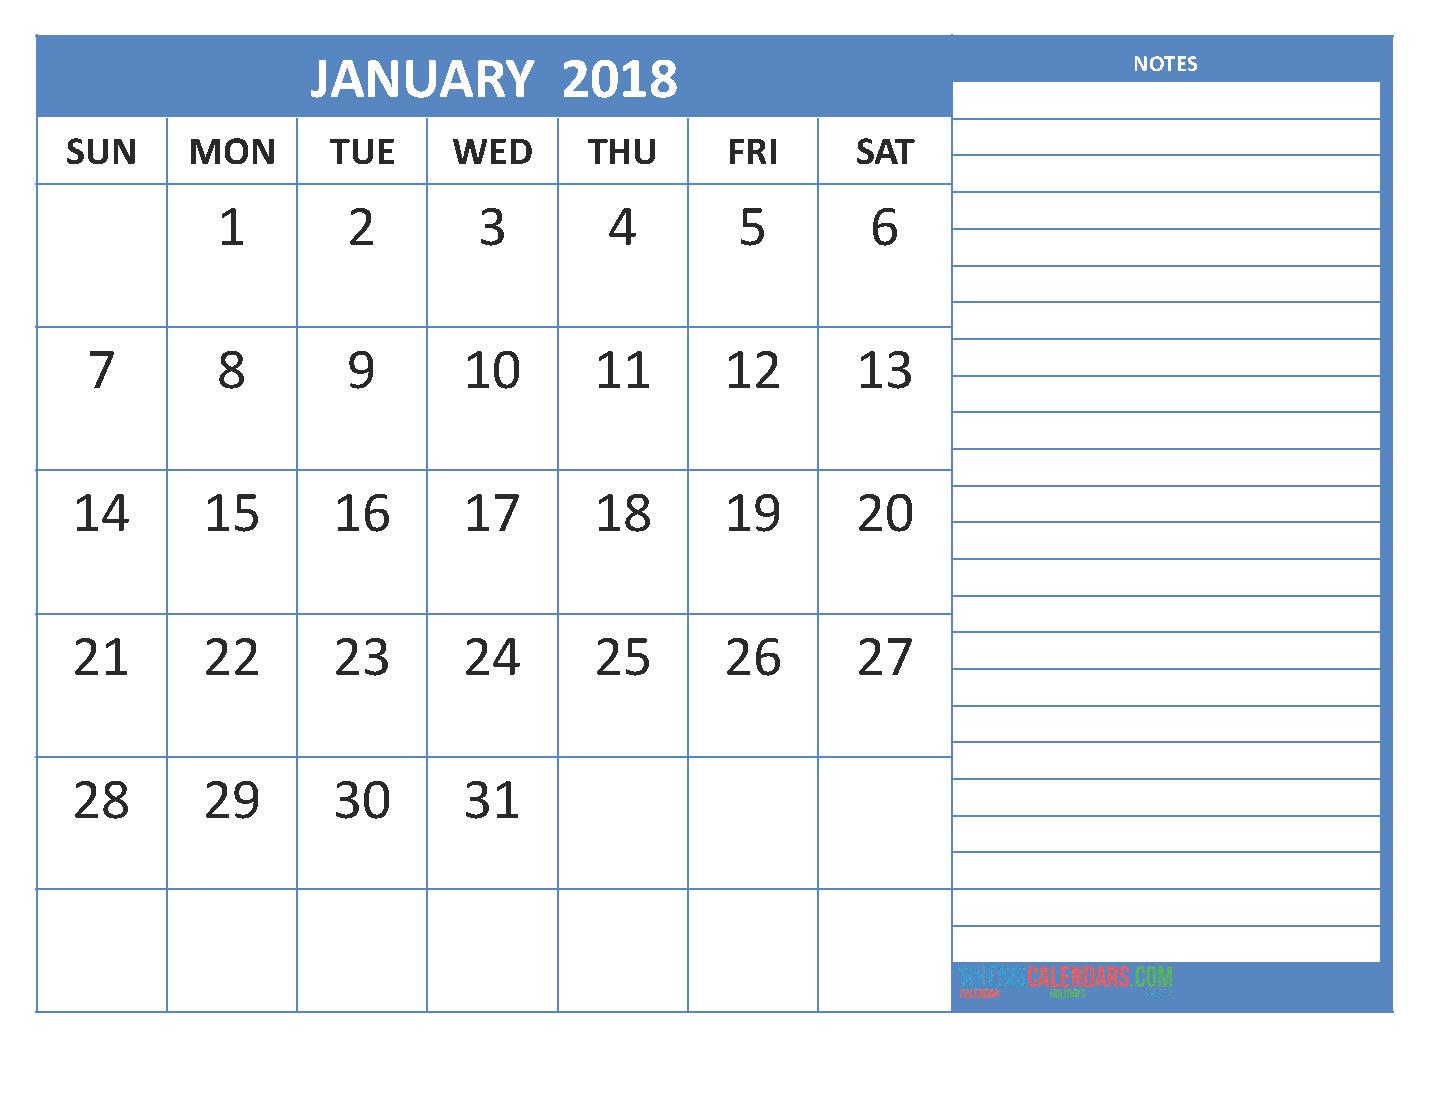 January 2018 Printable Calendar   Blank Templates - Get ...